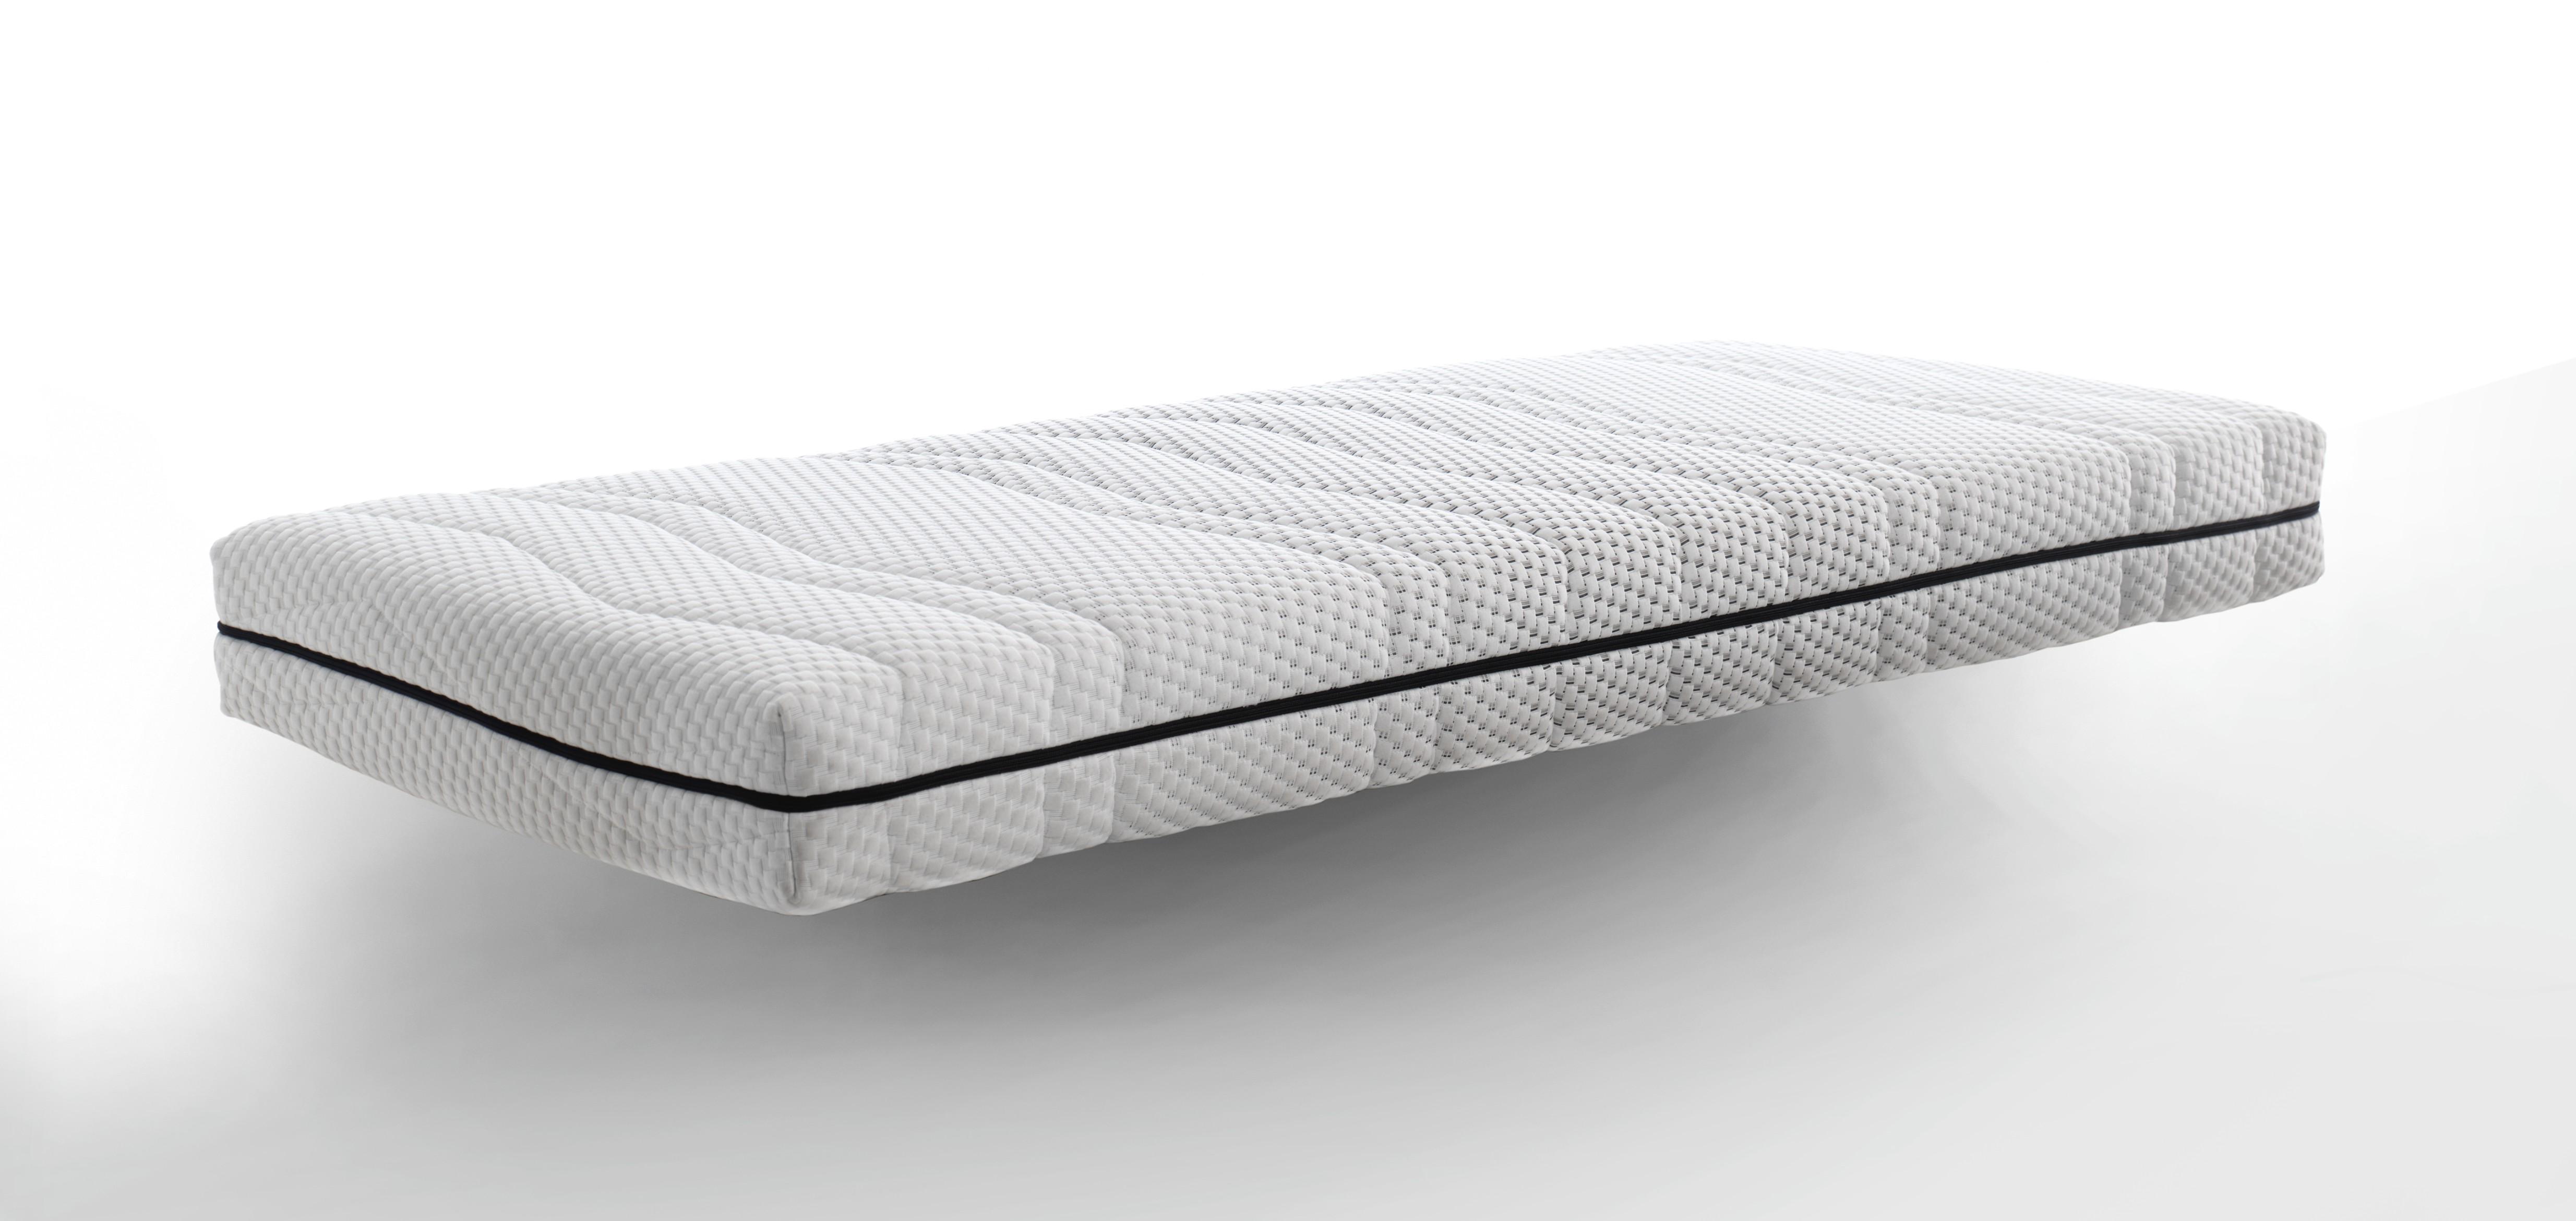 matelas lattoflex 100 latex 7 zones de confort soft medium ou ferme. Black Bedroom Furniture Sets. Home Design Ideas